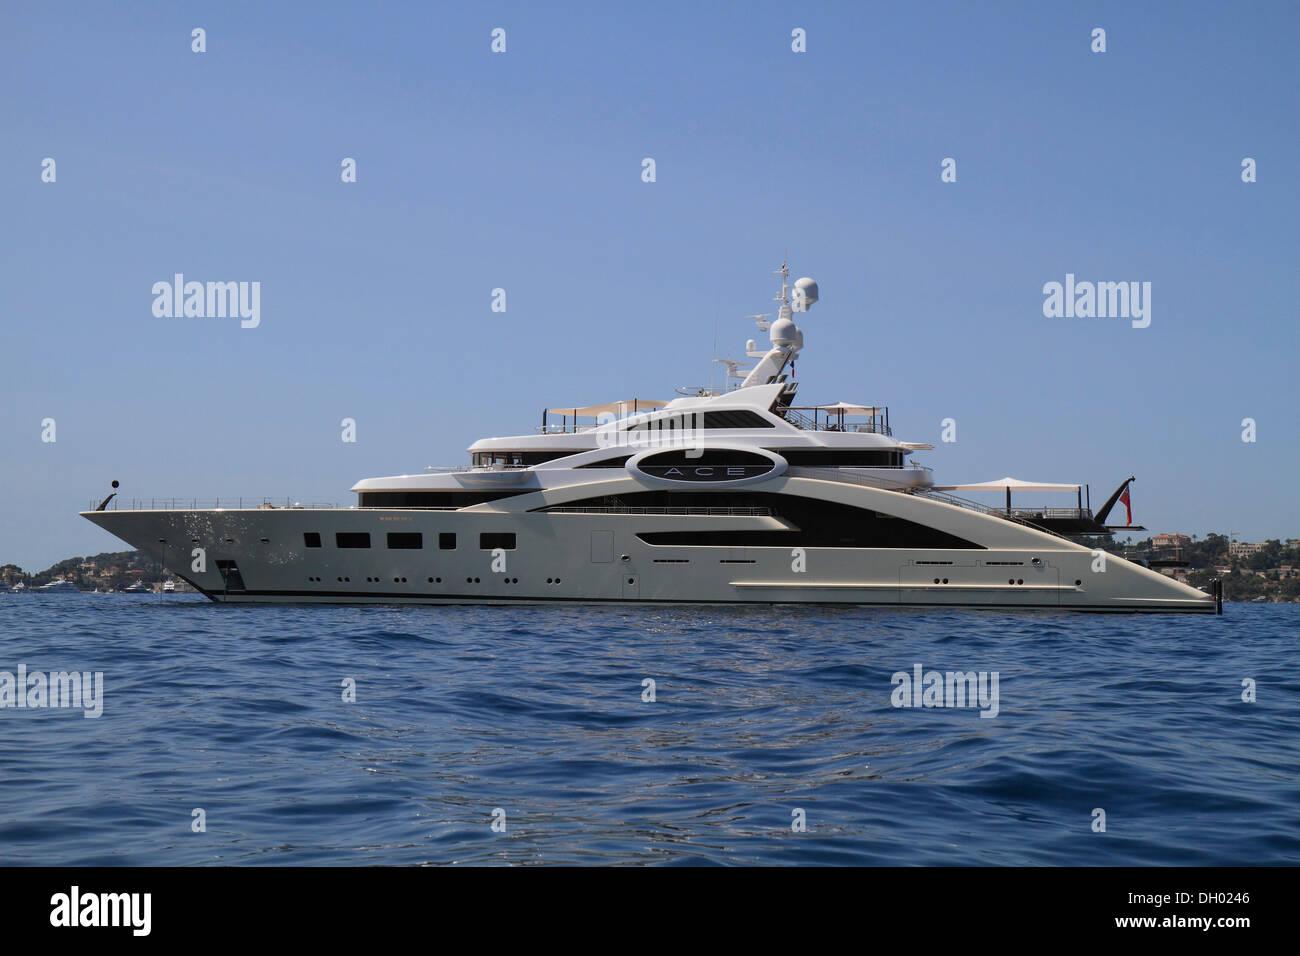 Motor yacht 'Ace' by shipyard Luerssen Yachts, length 87.0m, built in 2012m at Cap Ferrat, Côte d'Azur, France, Mediterranean - Stock Image